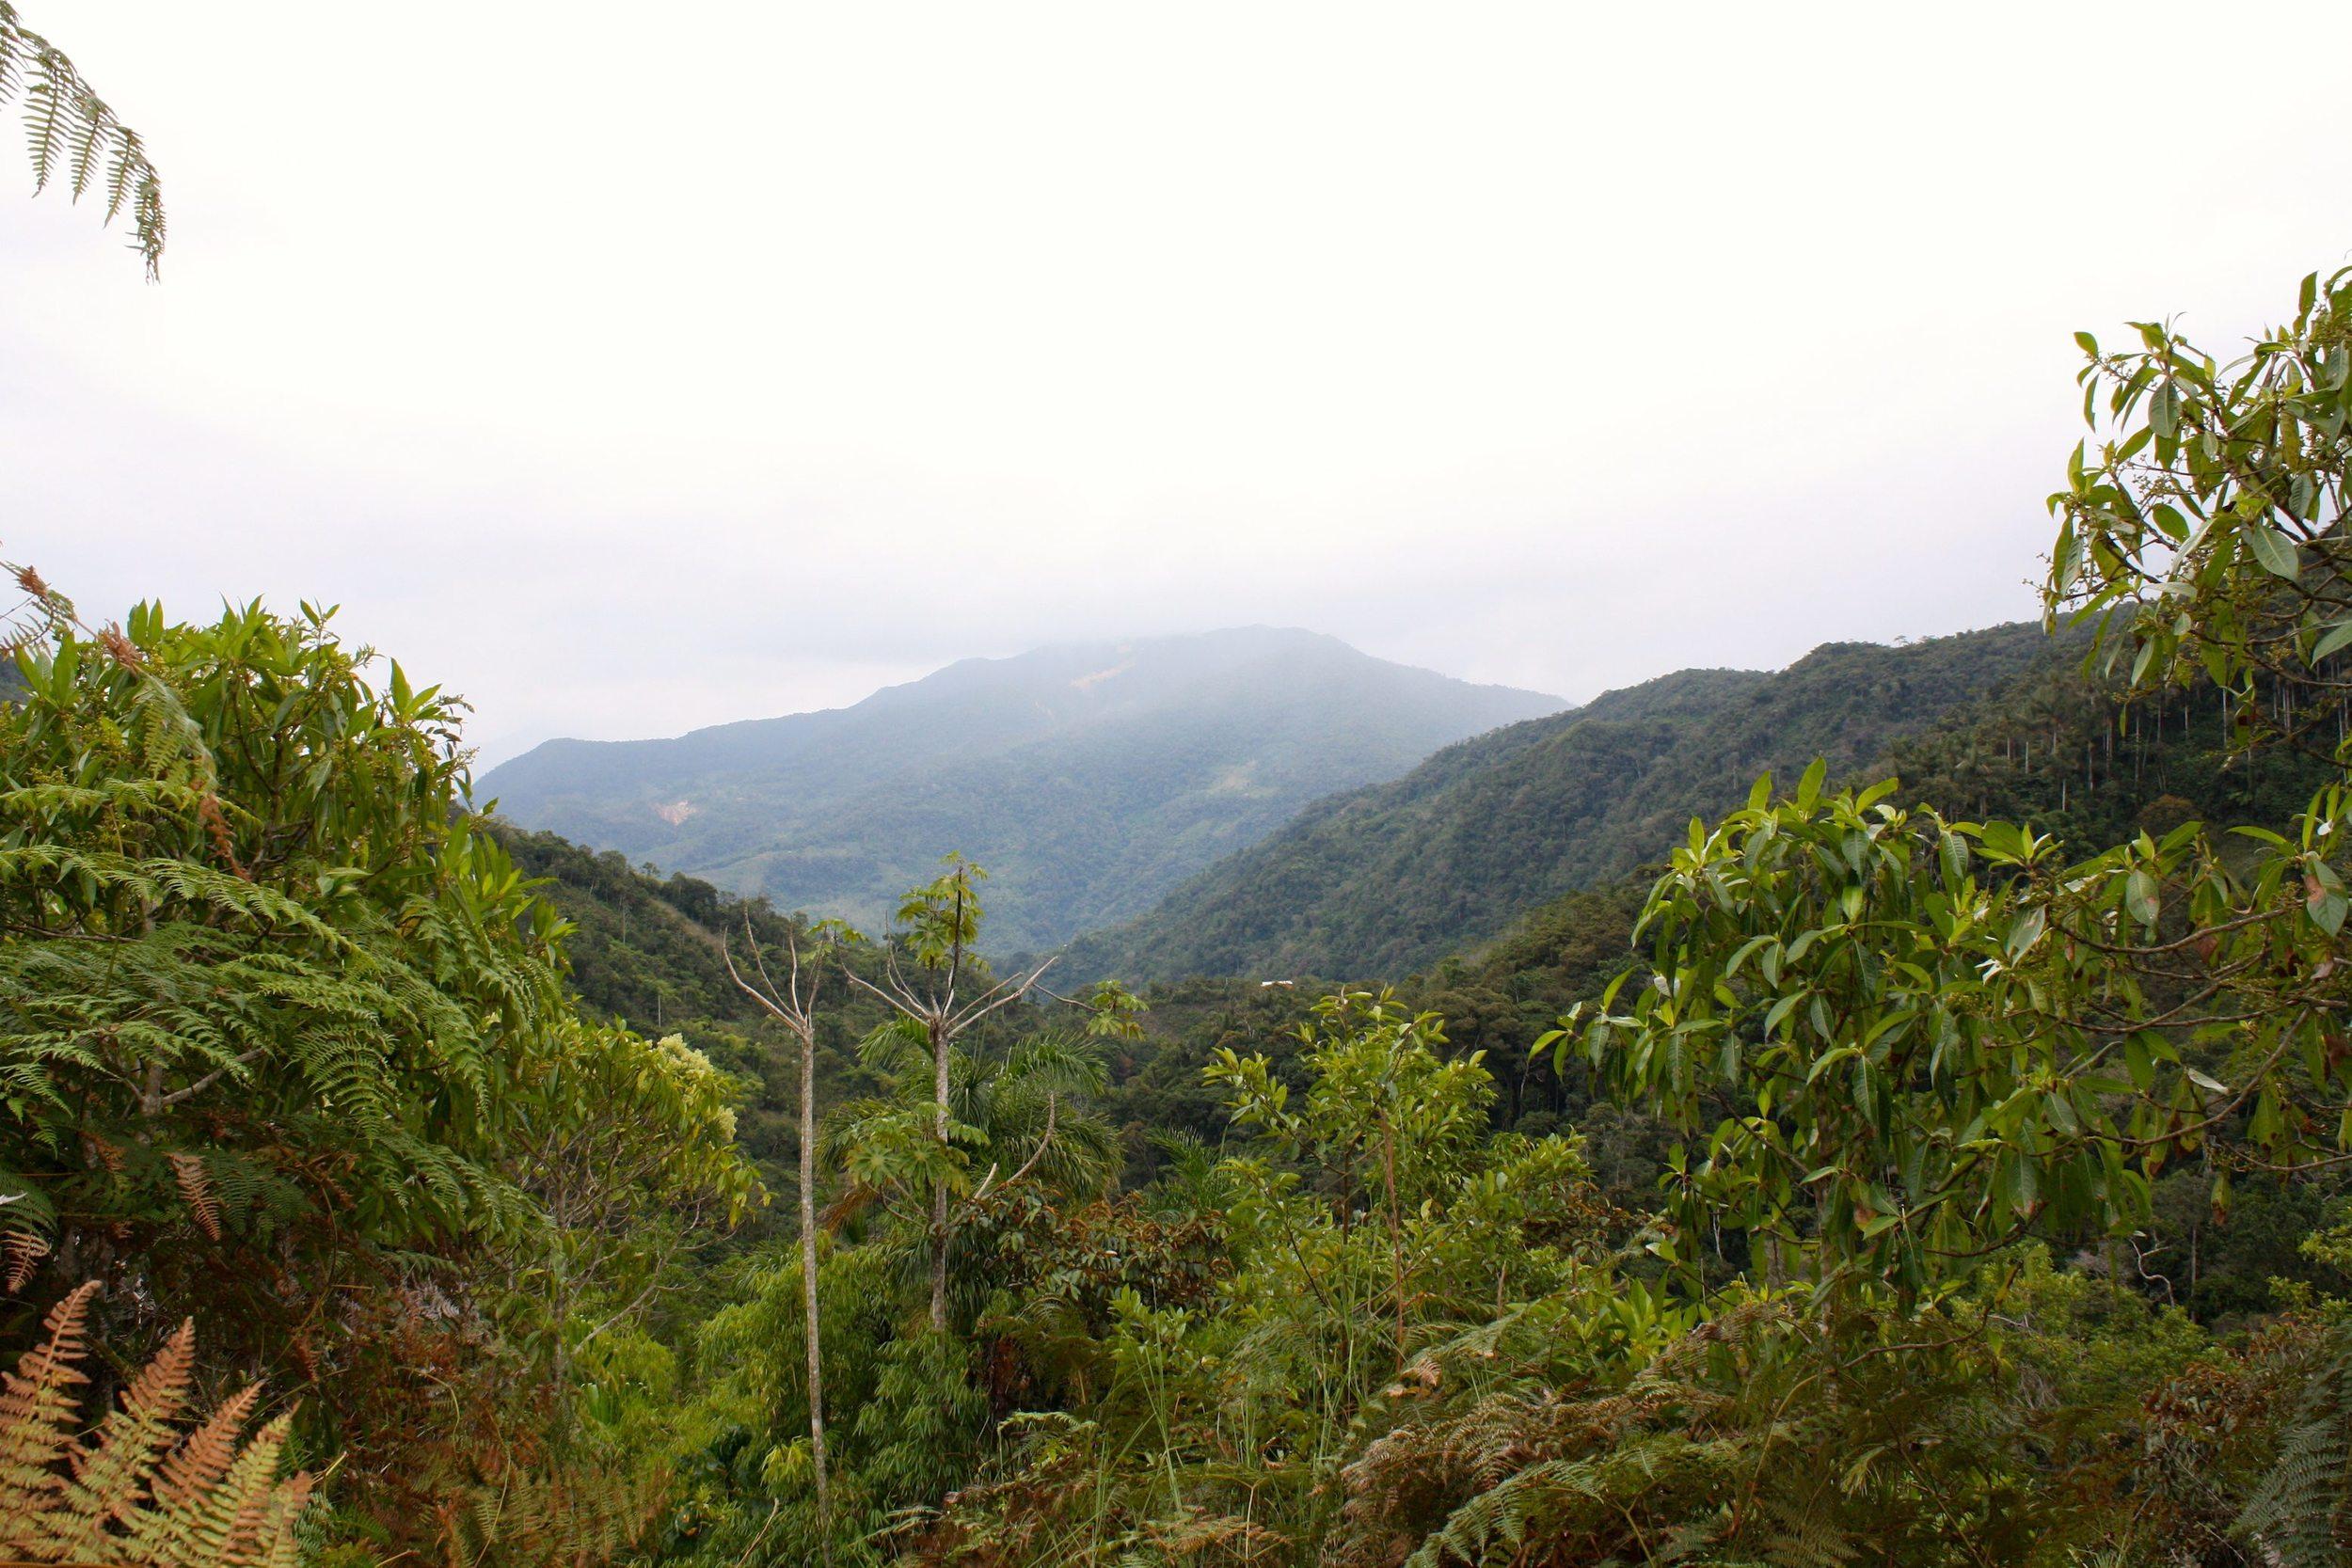 Coffee plantation overlooking the Sandia valley (Puno region, Peru)